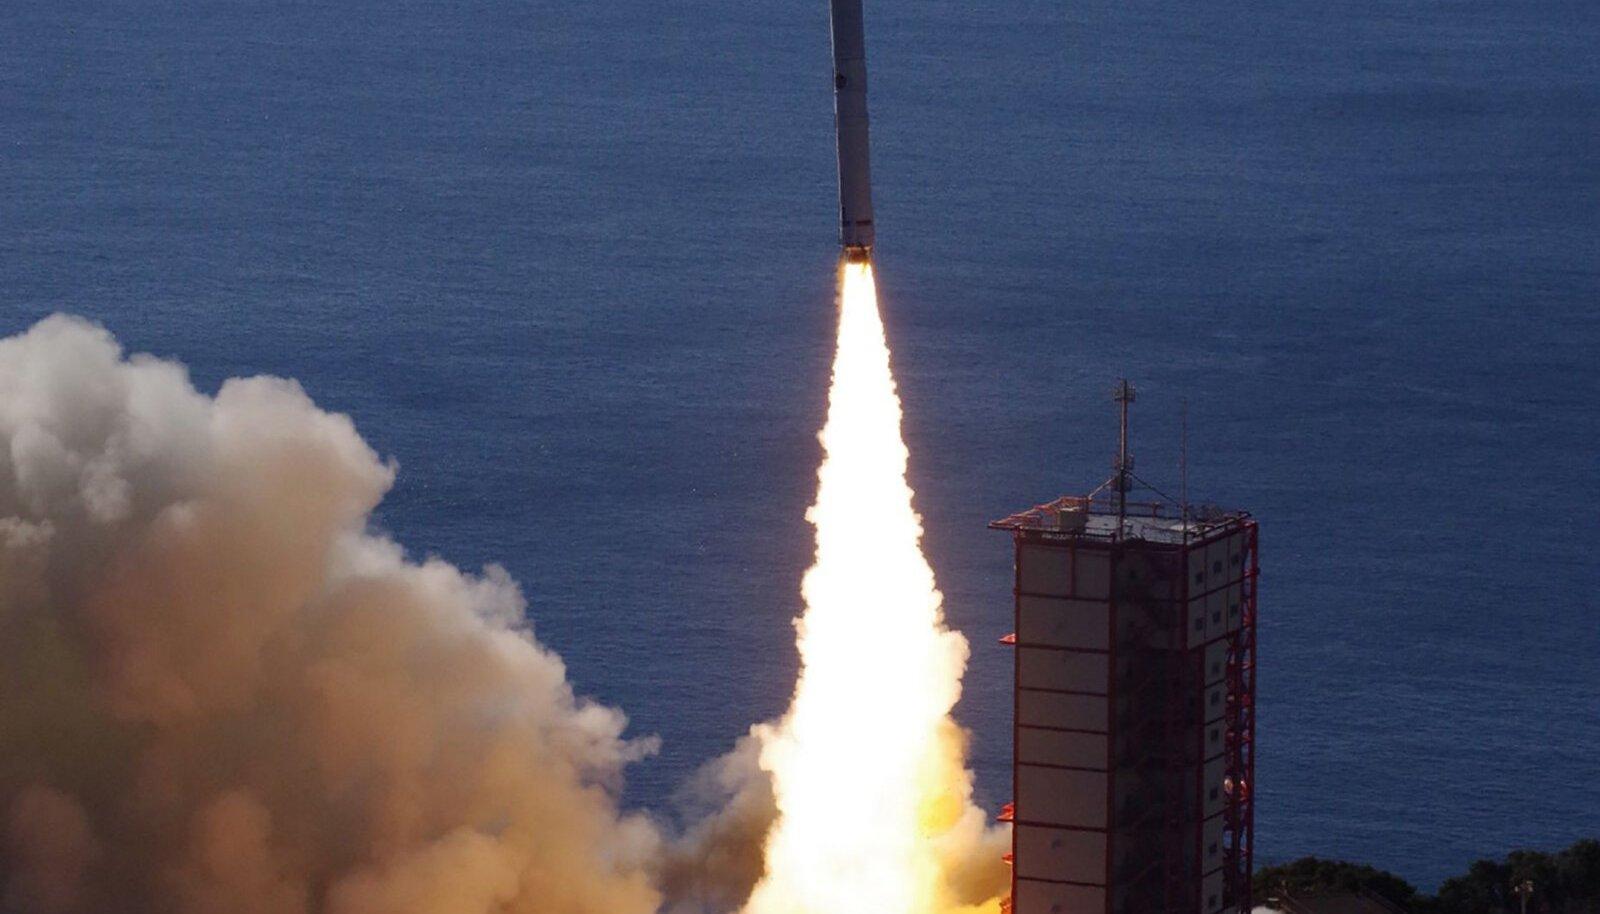 Epsilon-4 rakett õhku tõusmas